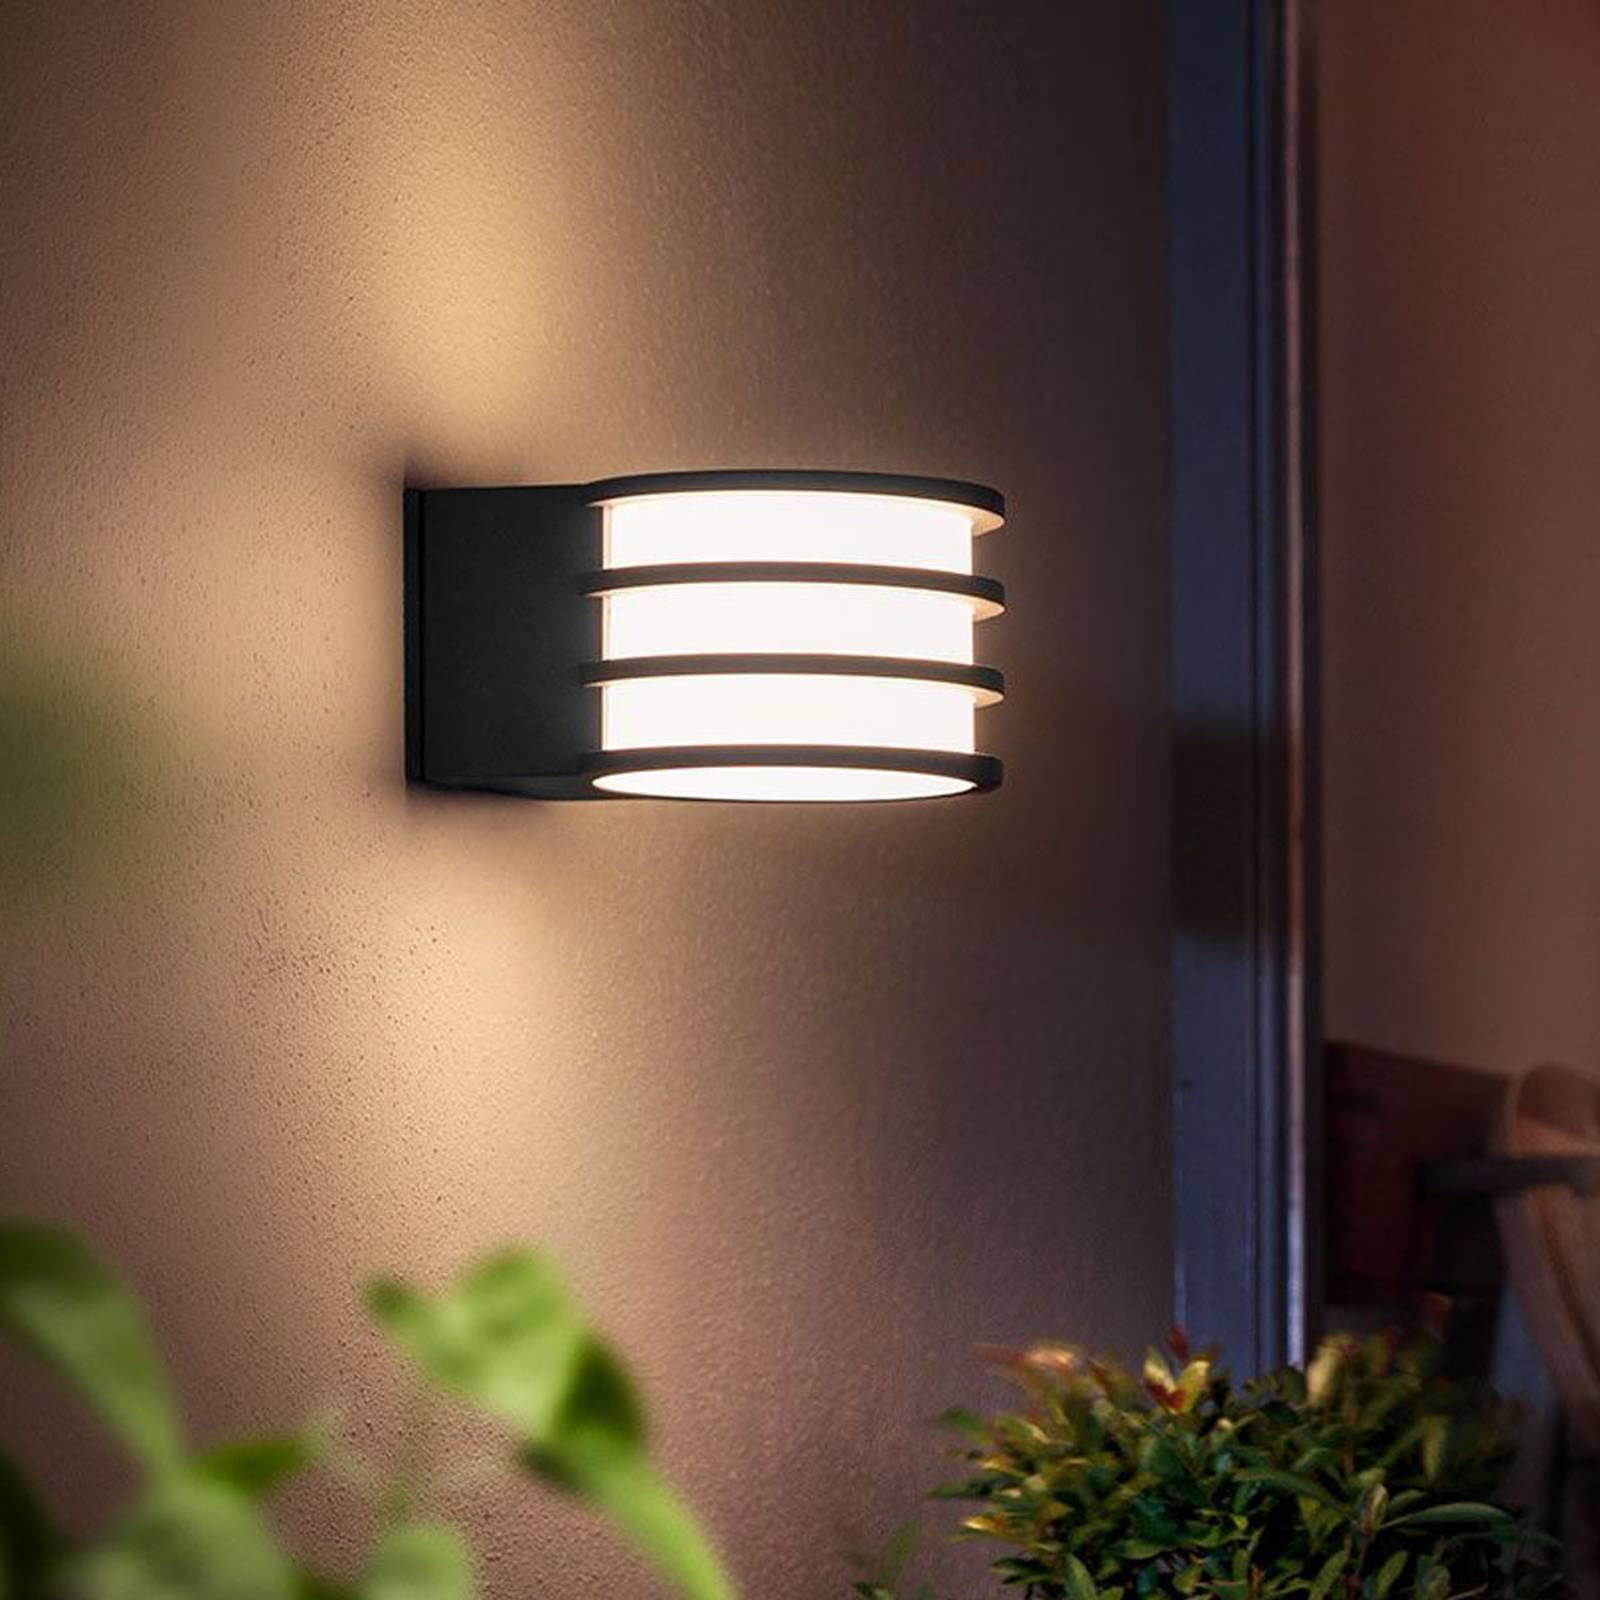 Philips Hue -LED-ulkoseinälamppu Lucca